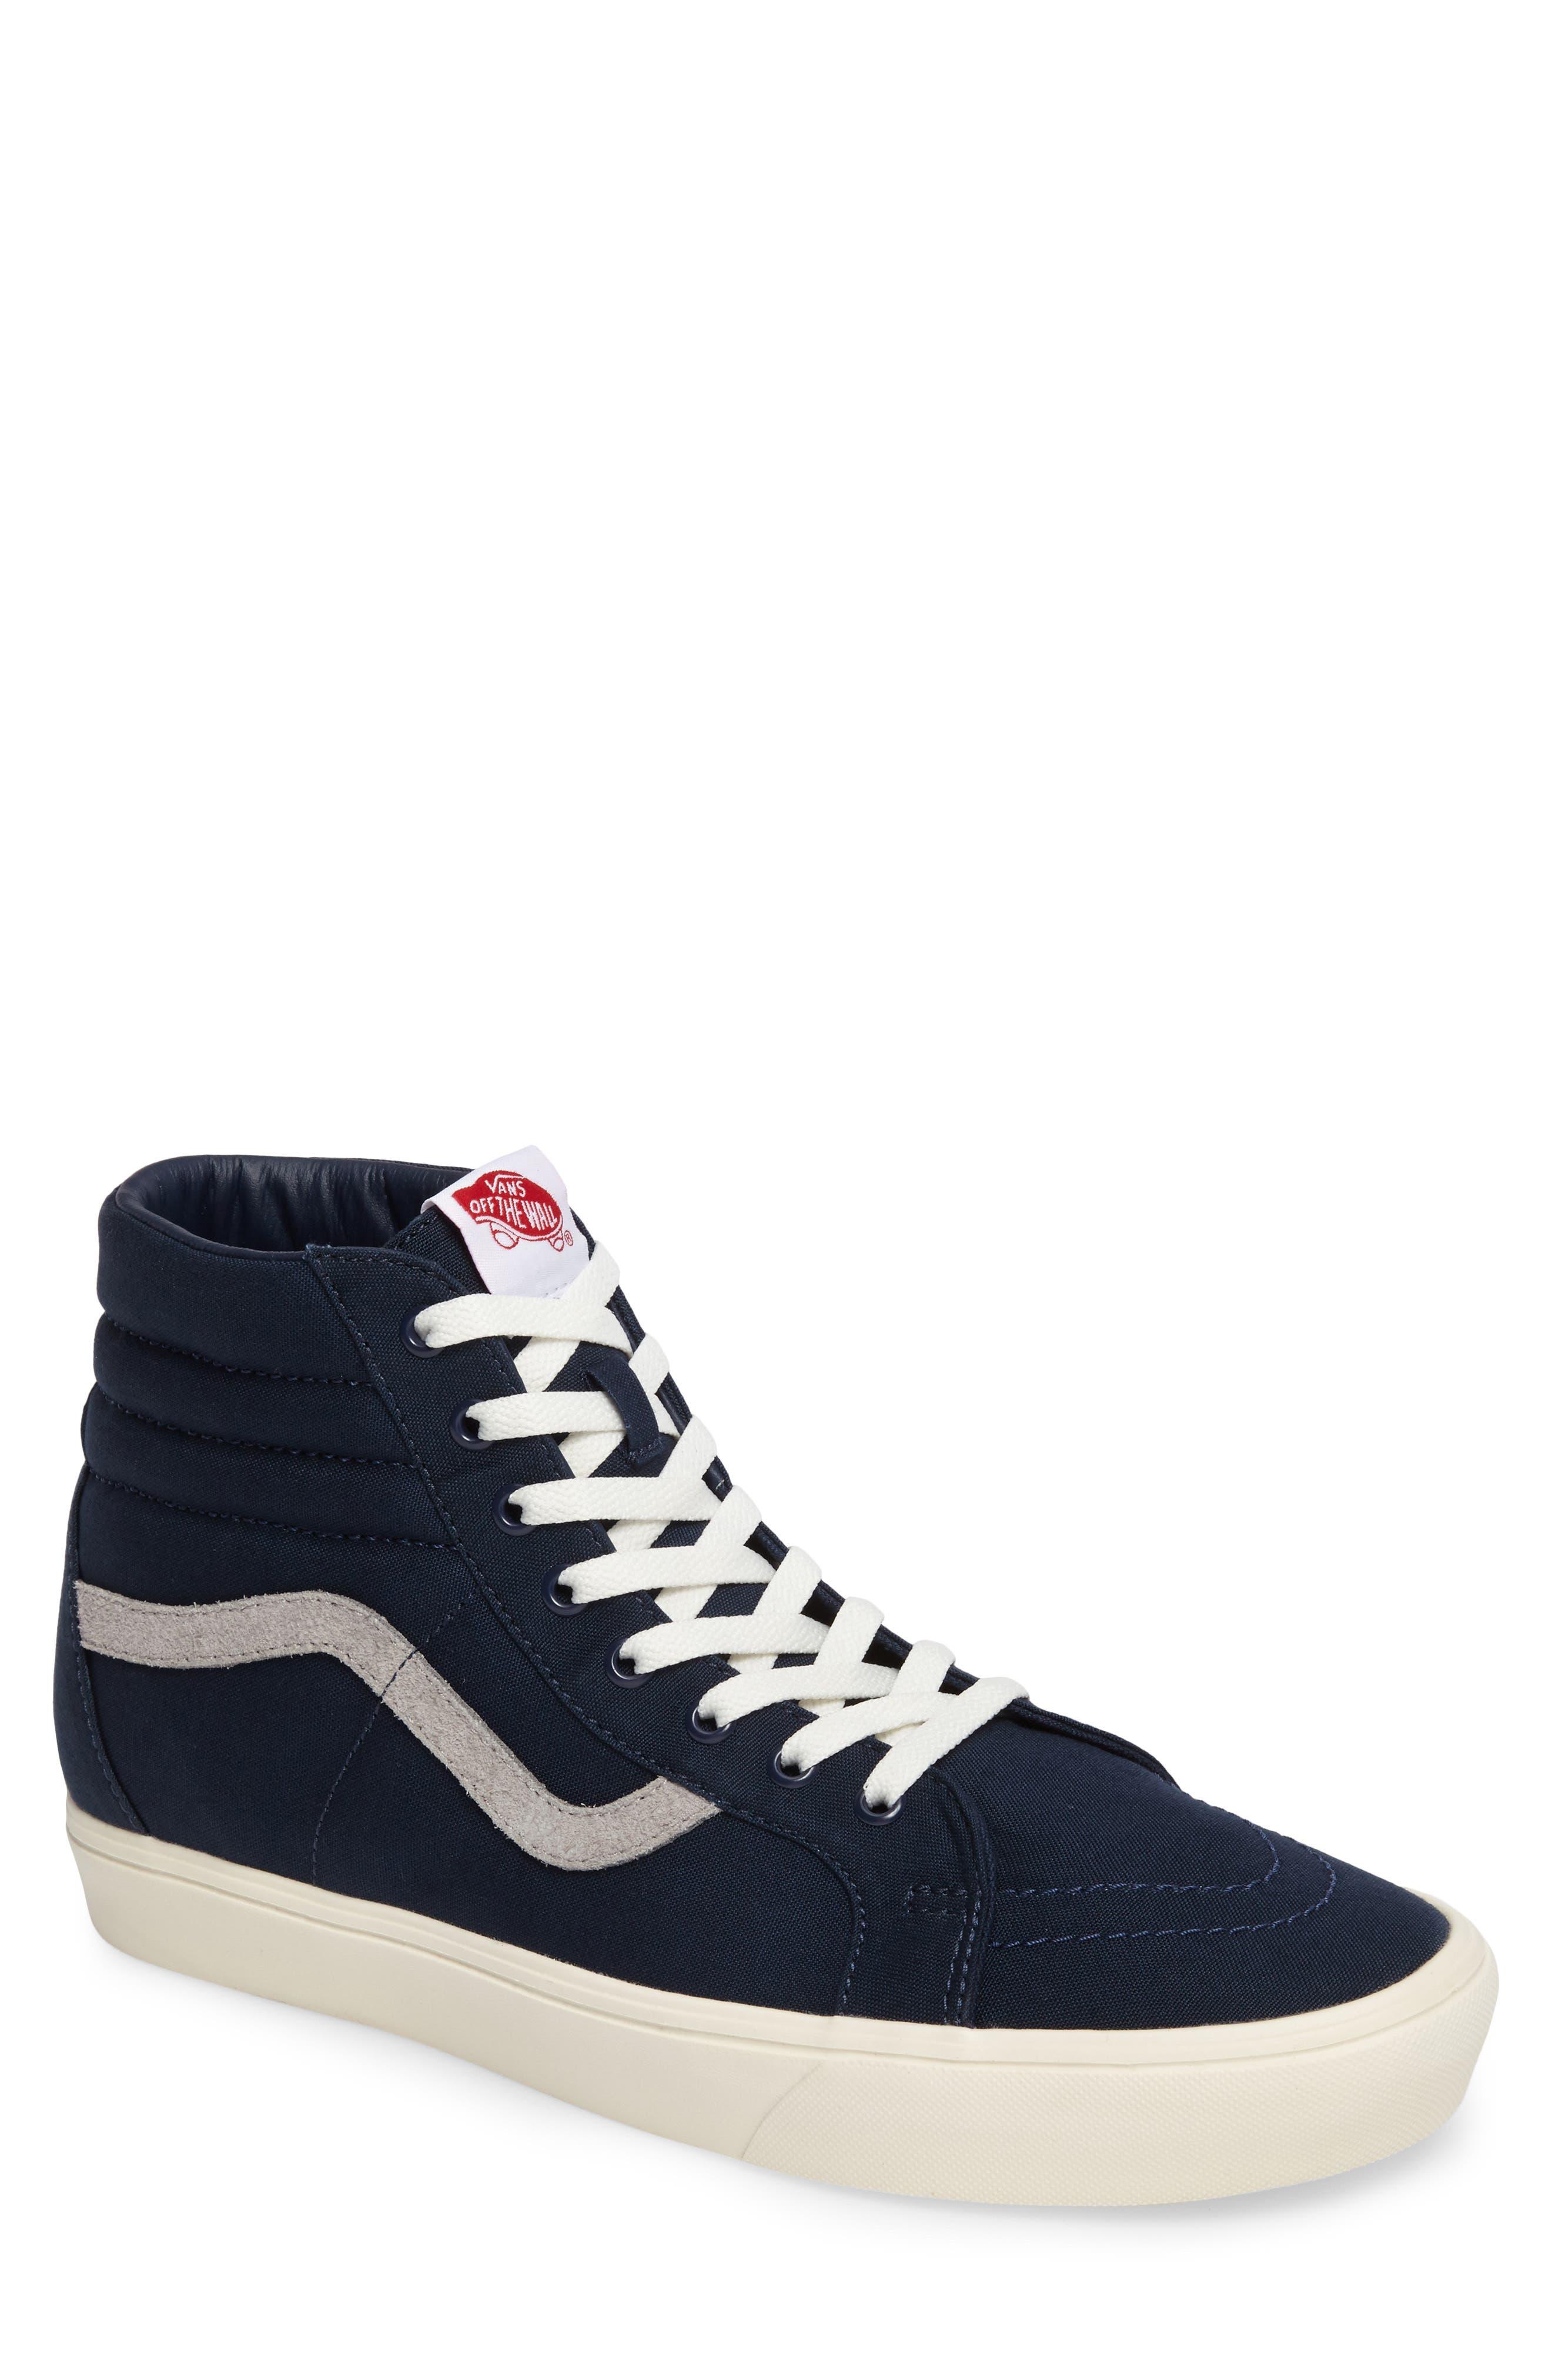 Sk80-Hi Reissue Lite Sneaker,                         Main,                         color, Dress Blues/Marshmallow Canvas